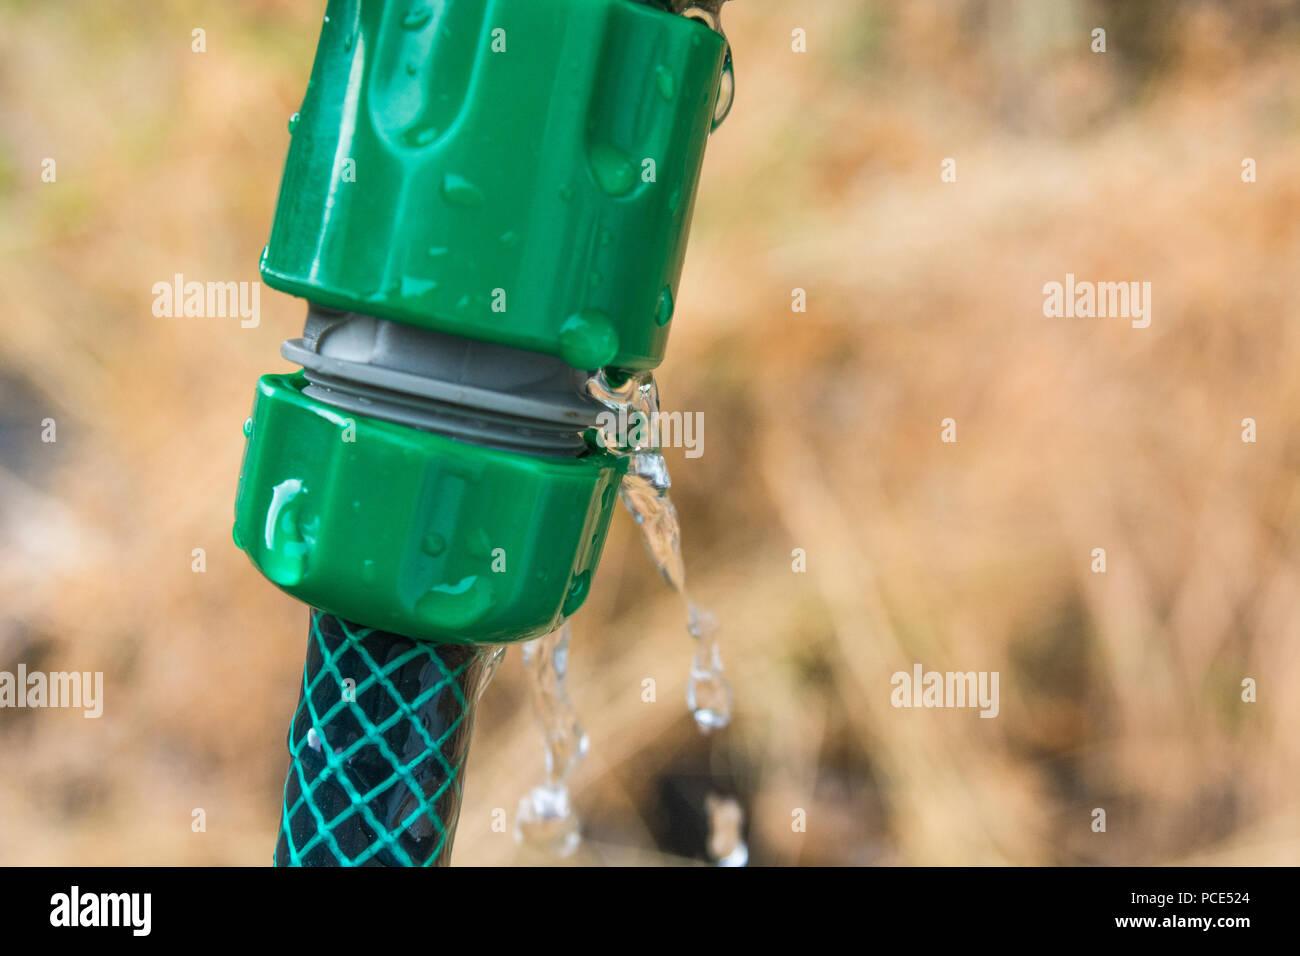 Leaking garden hosepipe spray gun hose - as metaphor for 2018 heatwave and UK drought, and hosepipe ban. - Stock Image